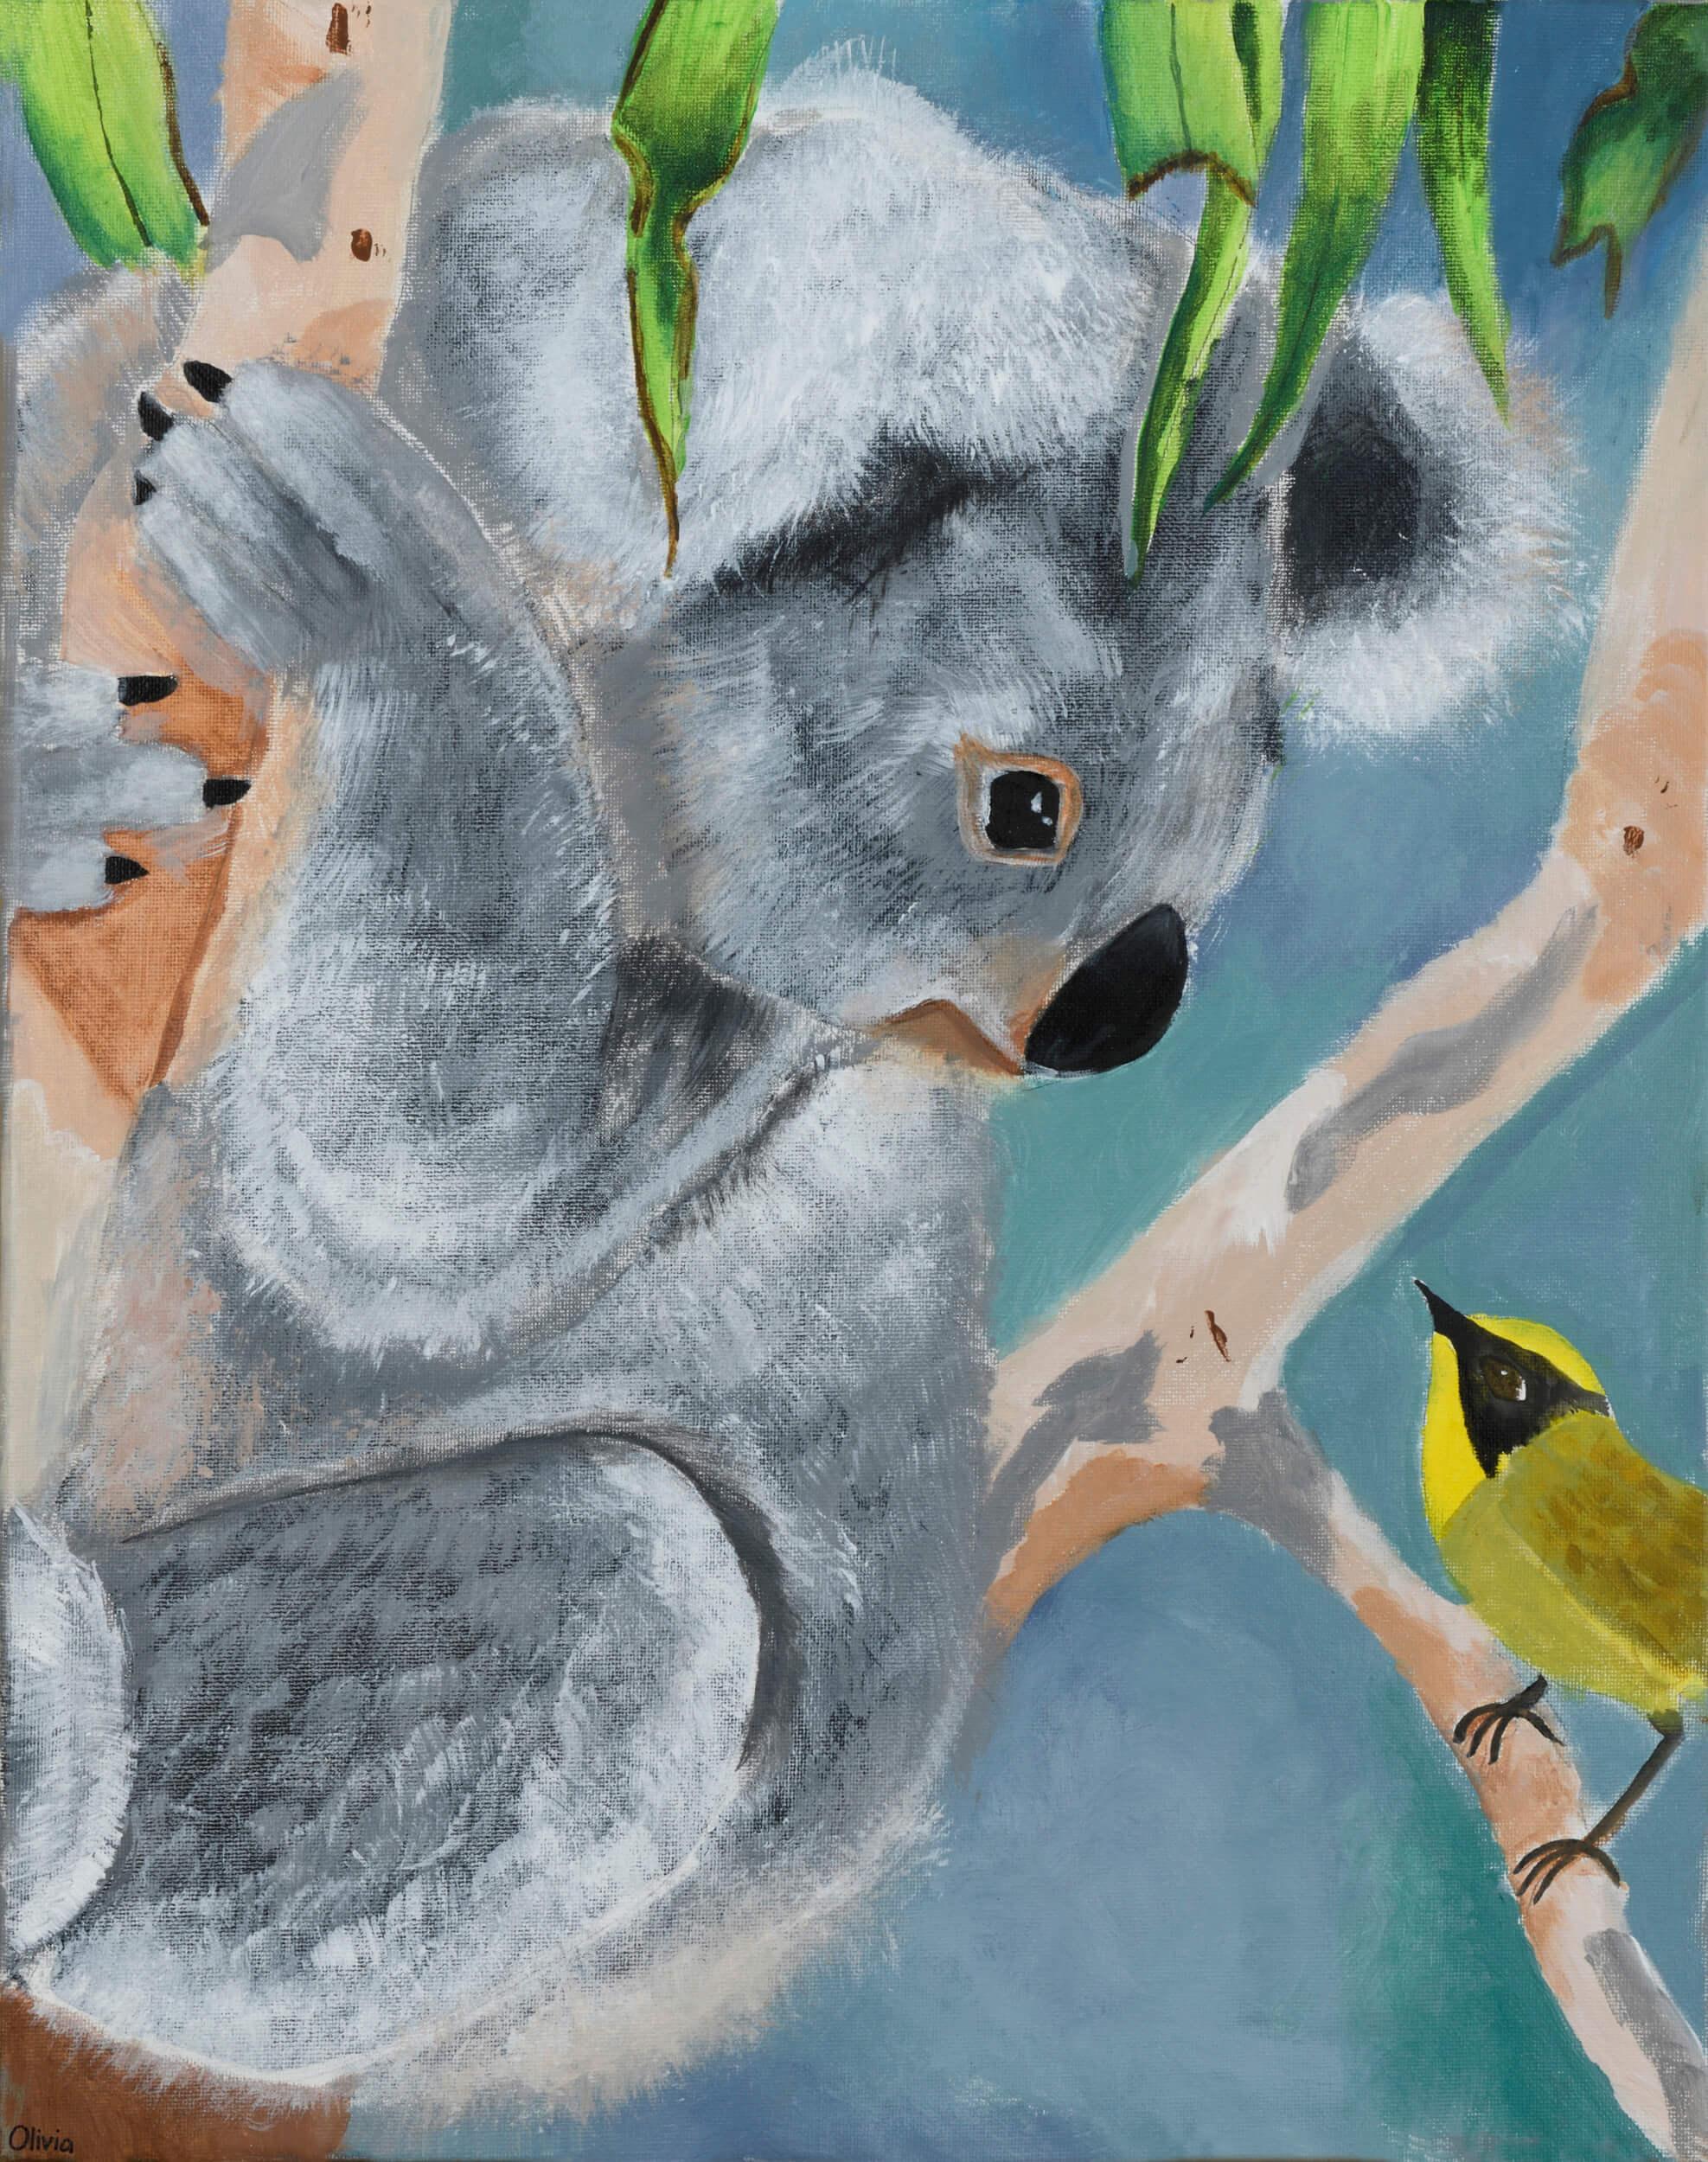 art-koala.jpg